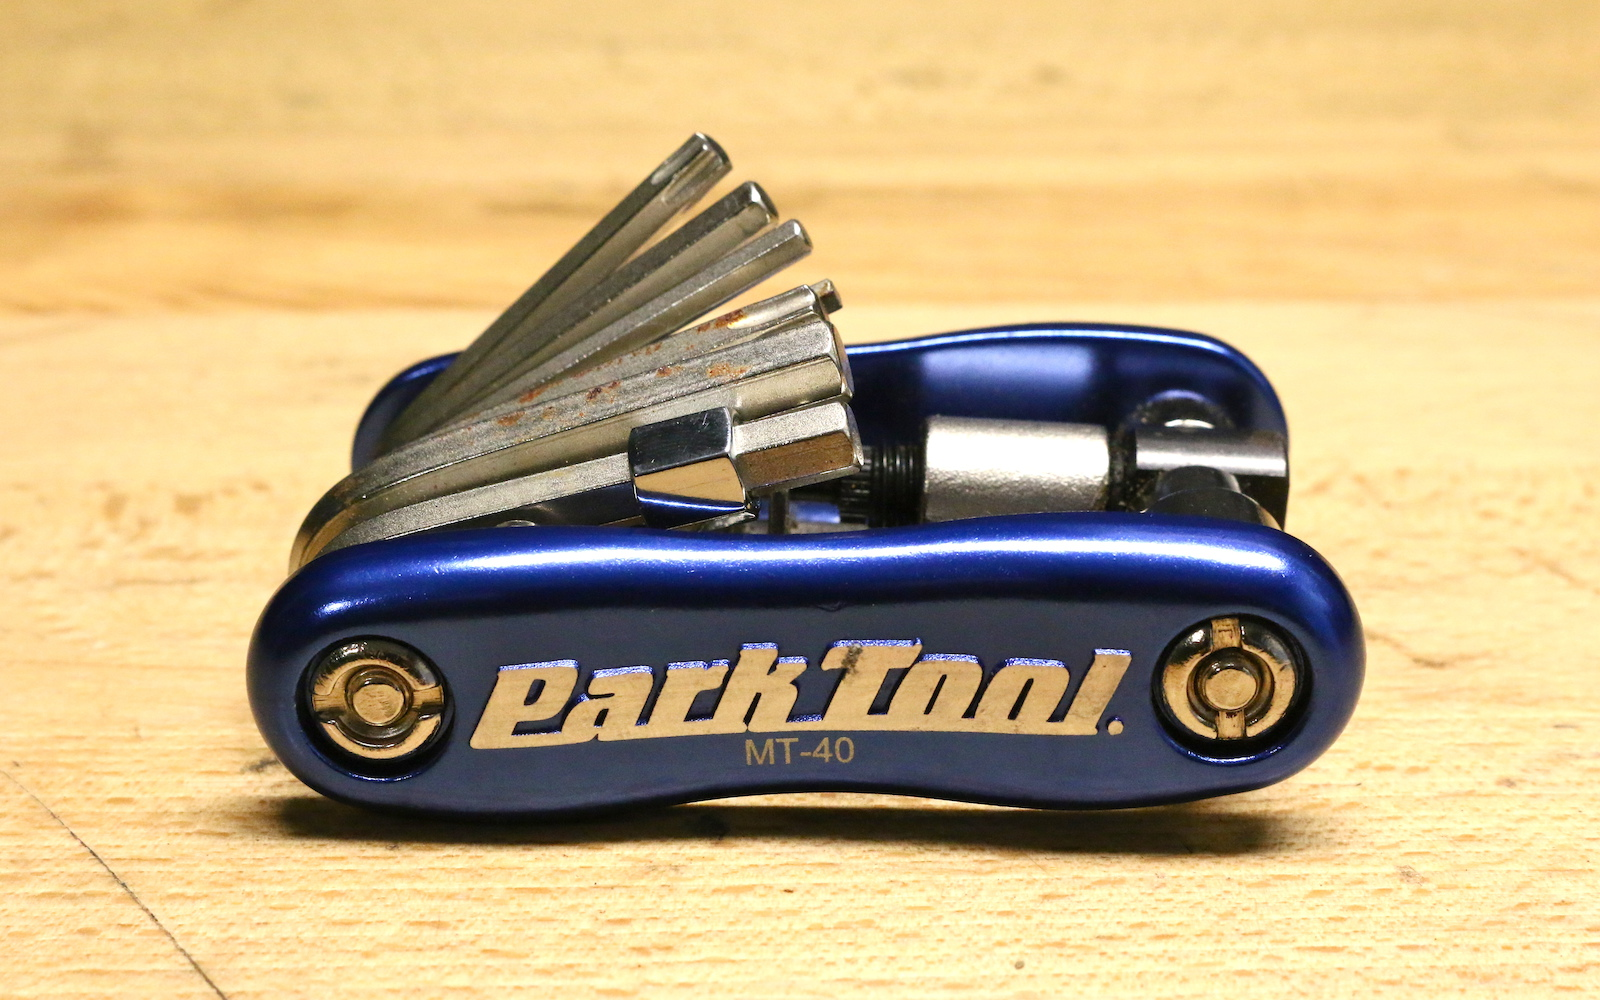 Park Tool MT-40 review test